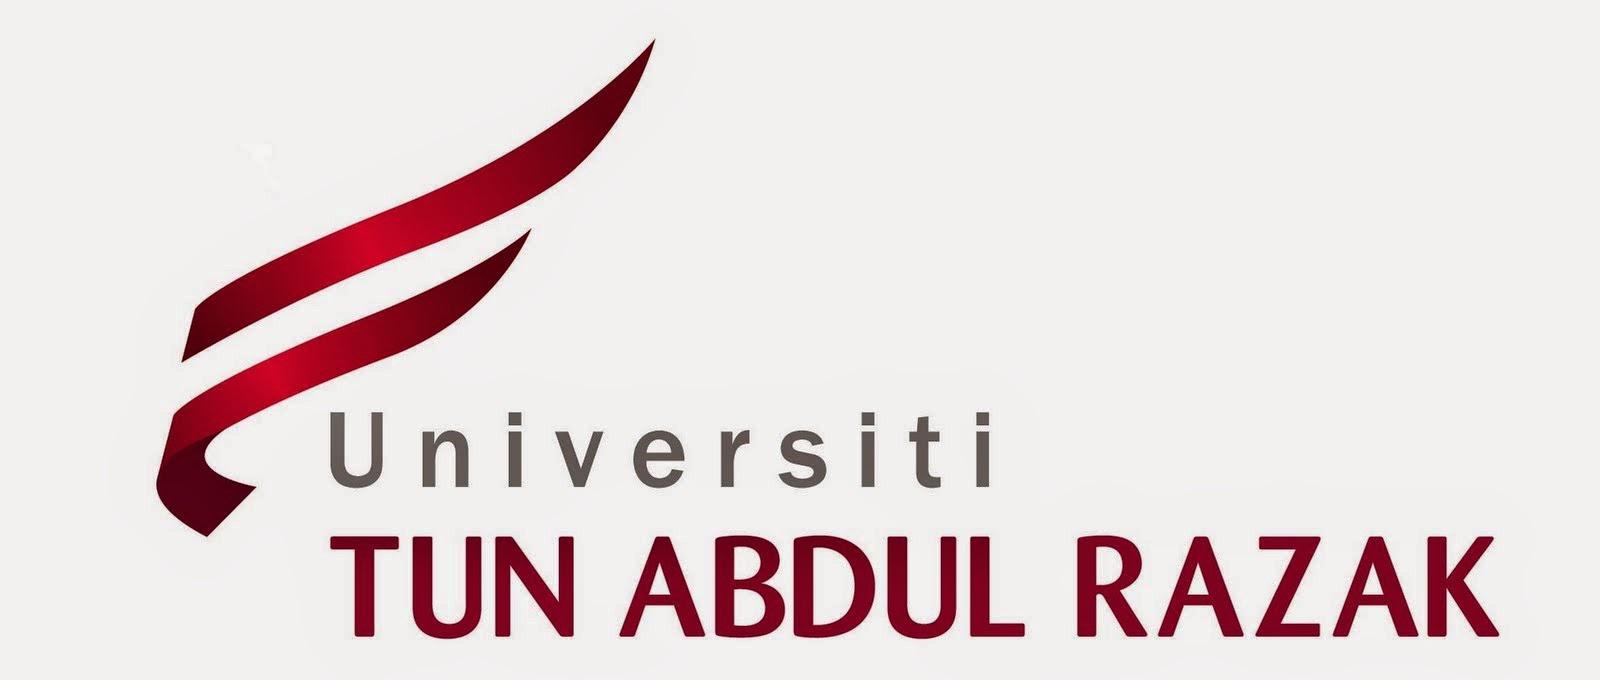 Jawatan Kerja Kosong Universiti Tun Abdul Razak (UniRAZAK) logo www.ohjob.info mei 2015